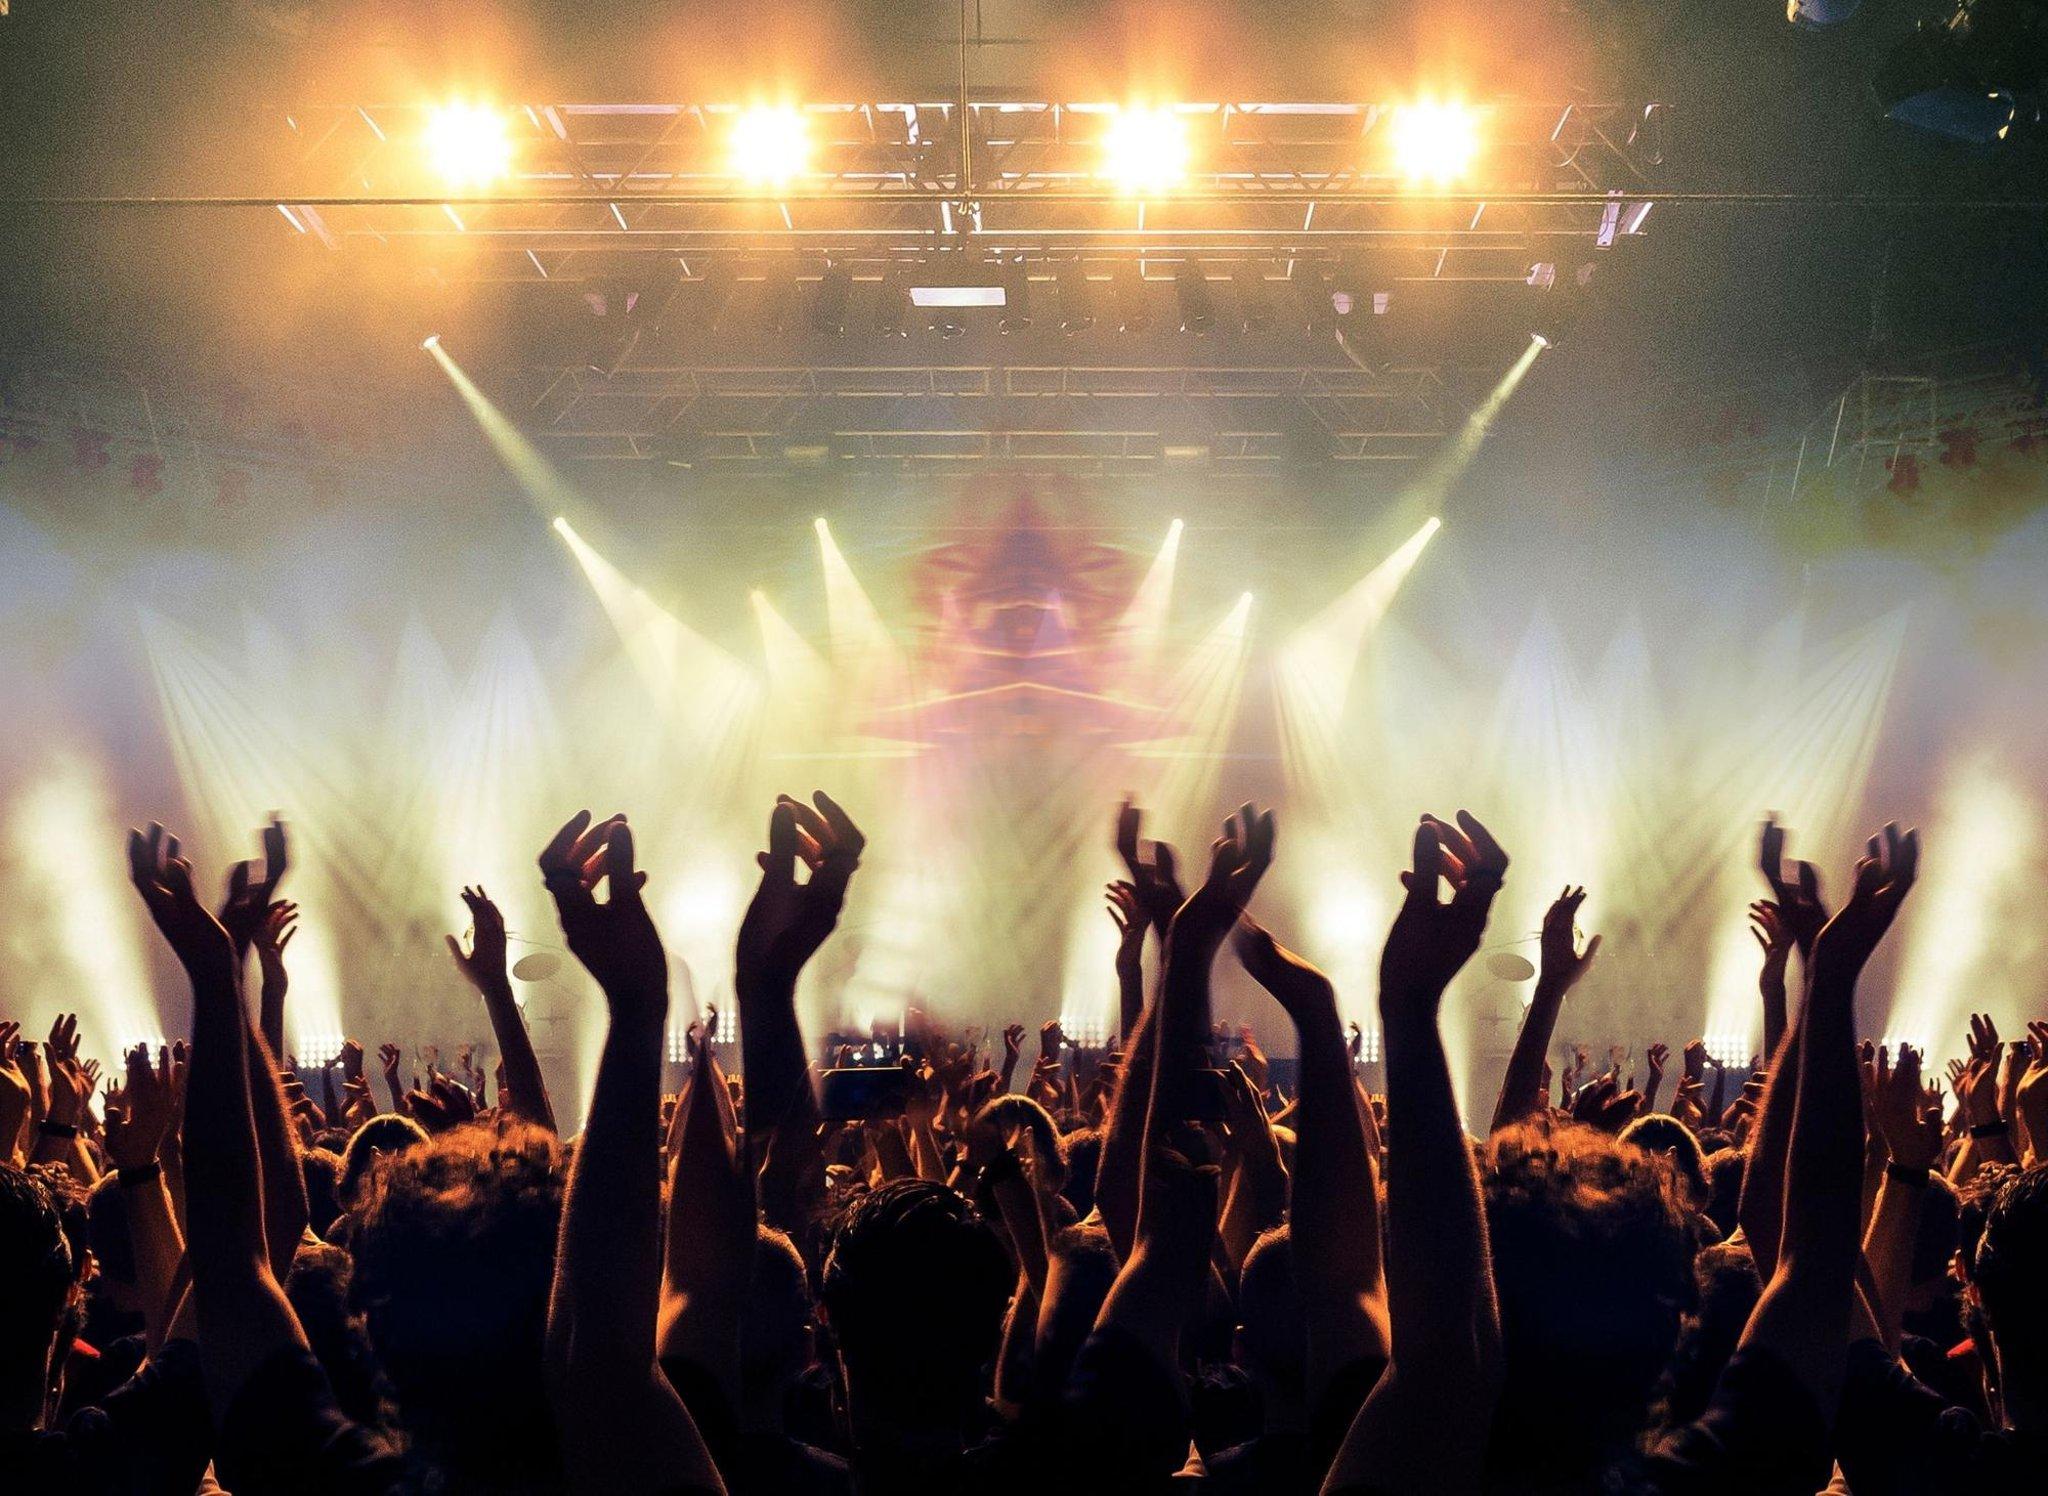 Berikut adalah 7 festival musik Eropa murah untuk tahun 2022 – termasuk Killers, Nick Cave, dan Kasabian dengan harga kurang dari £70